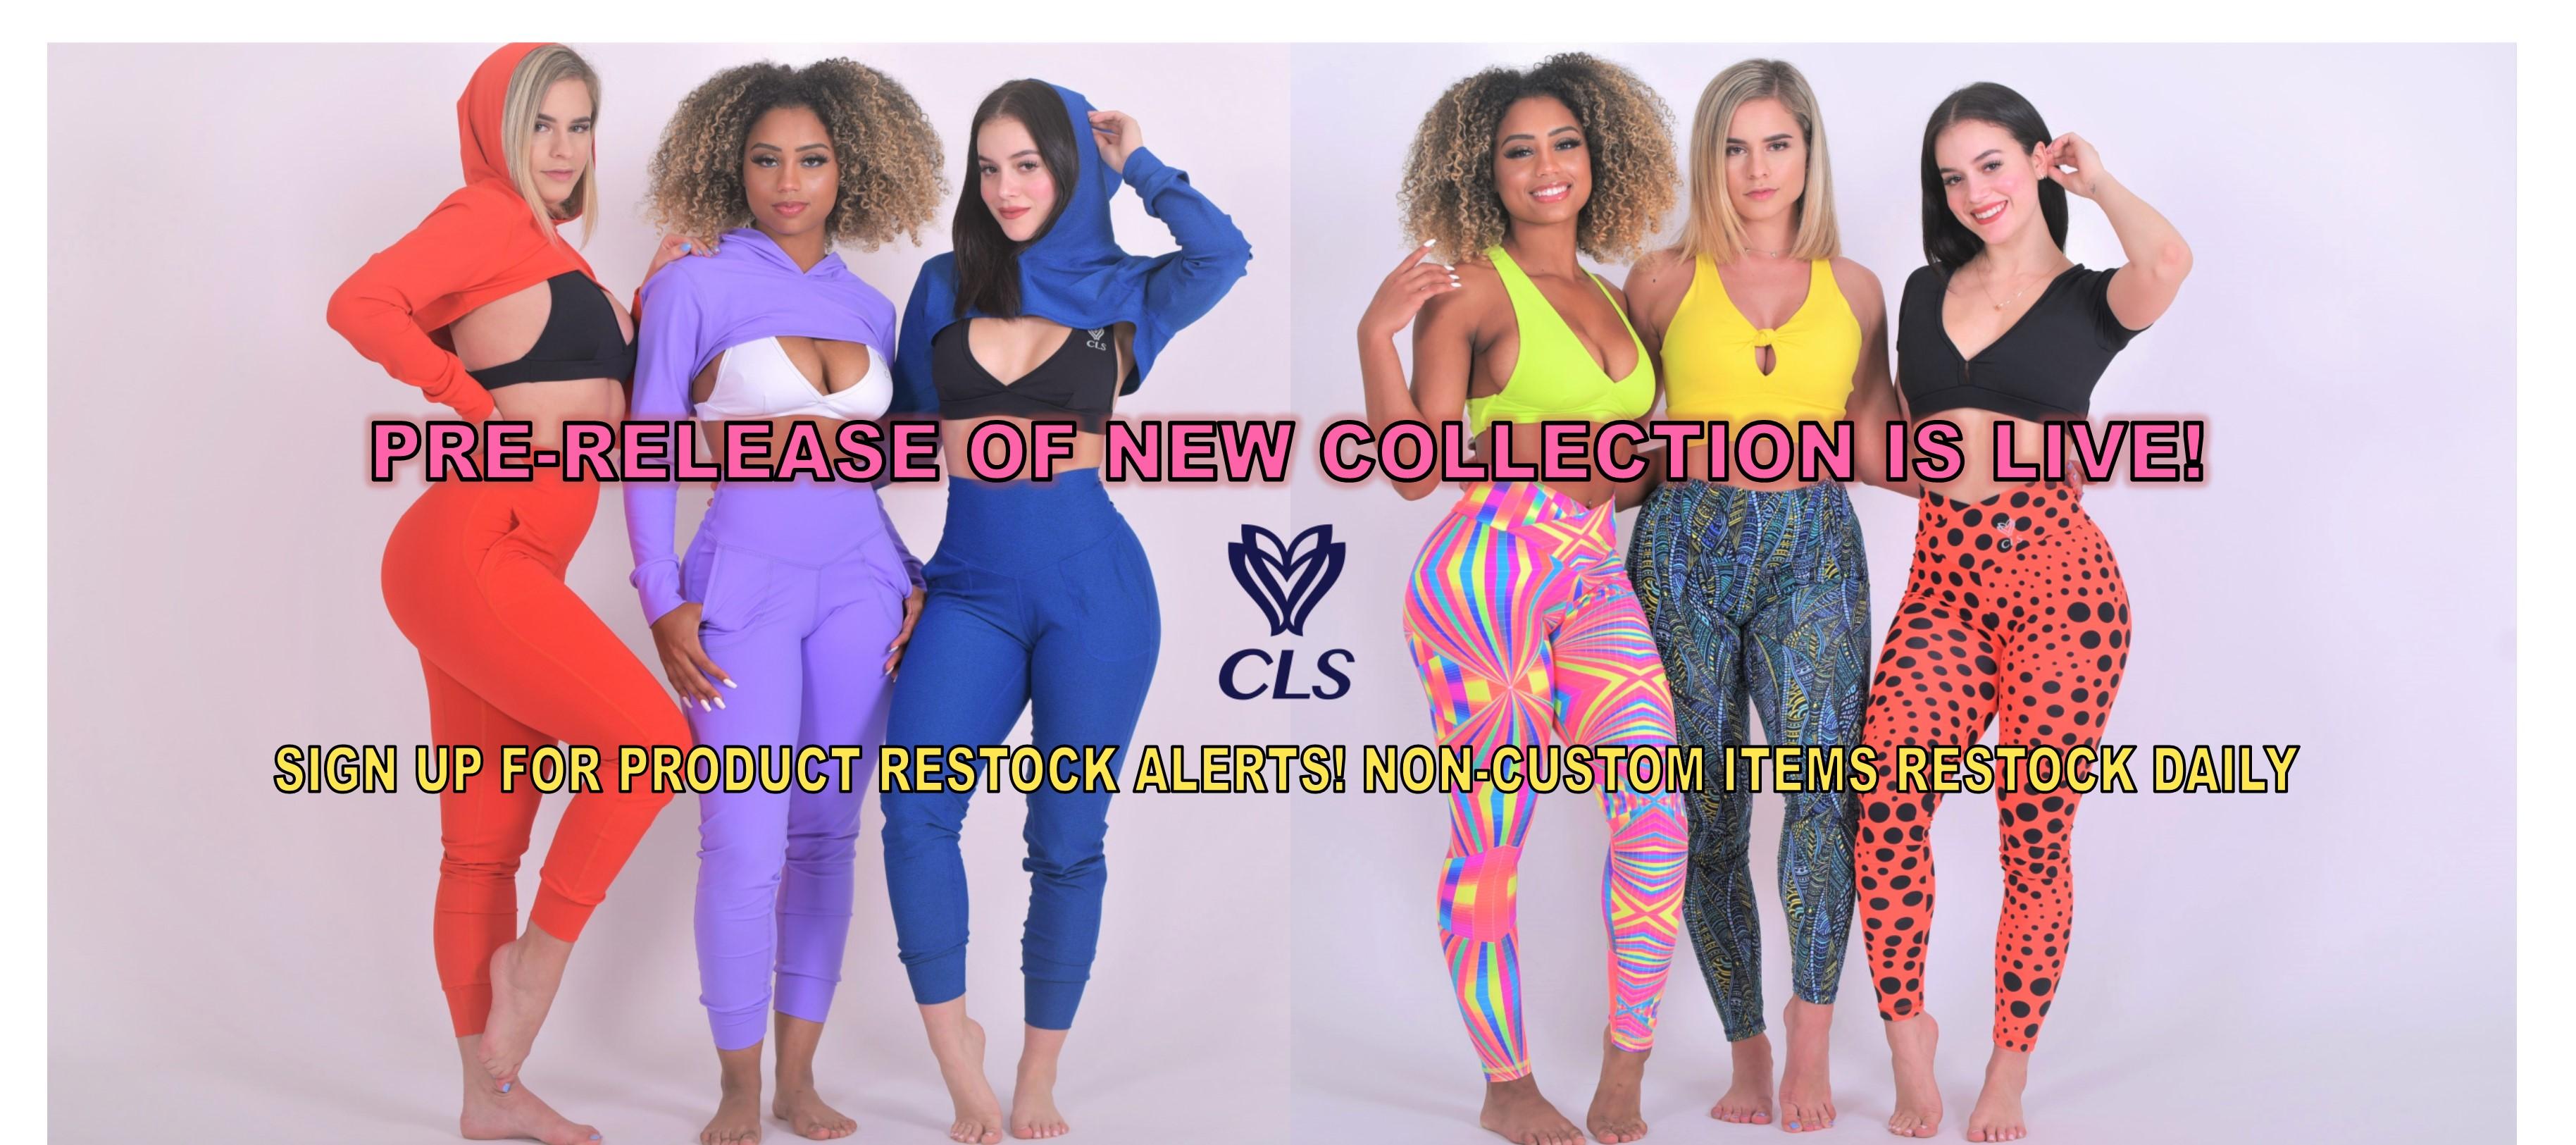 https://www.clssportswear.com/wp-content/uploads/2020/02/Announce_Slider_CLS.jpg